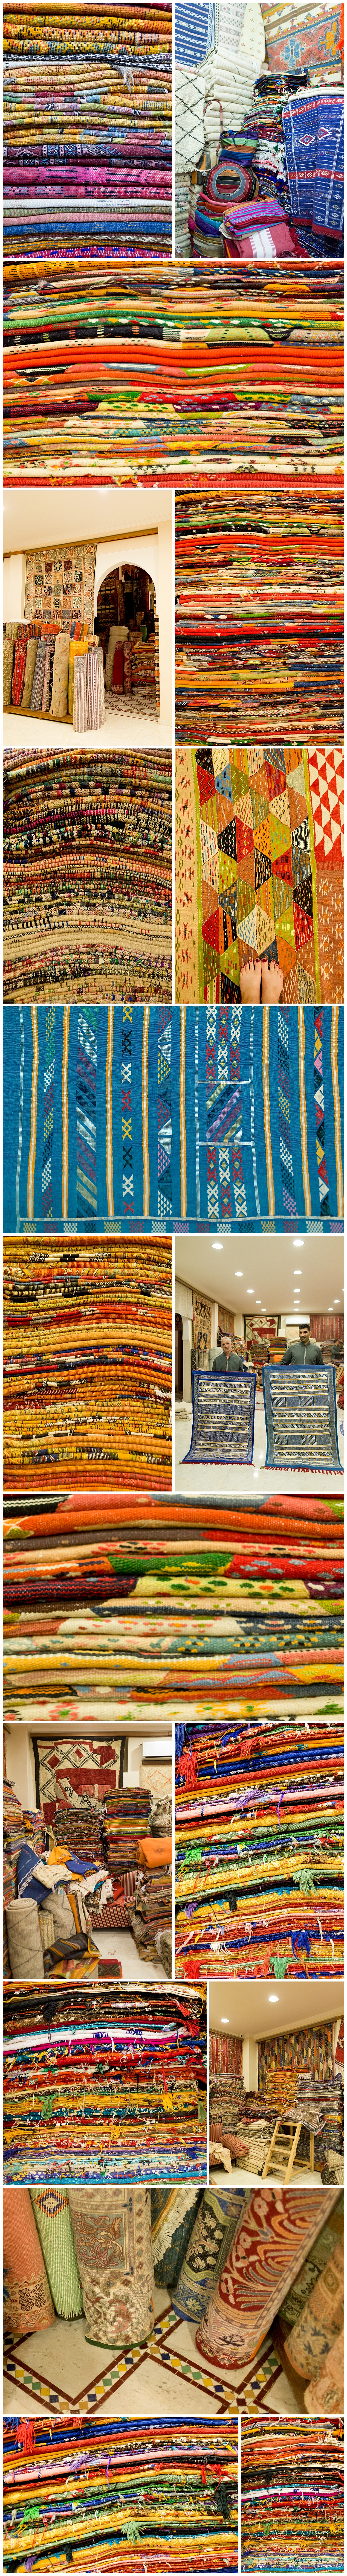 shopping for a rug in Marrakech, Morocco